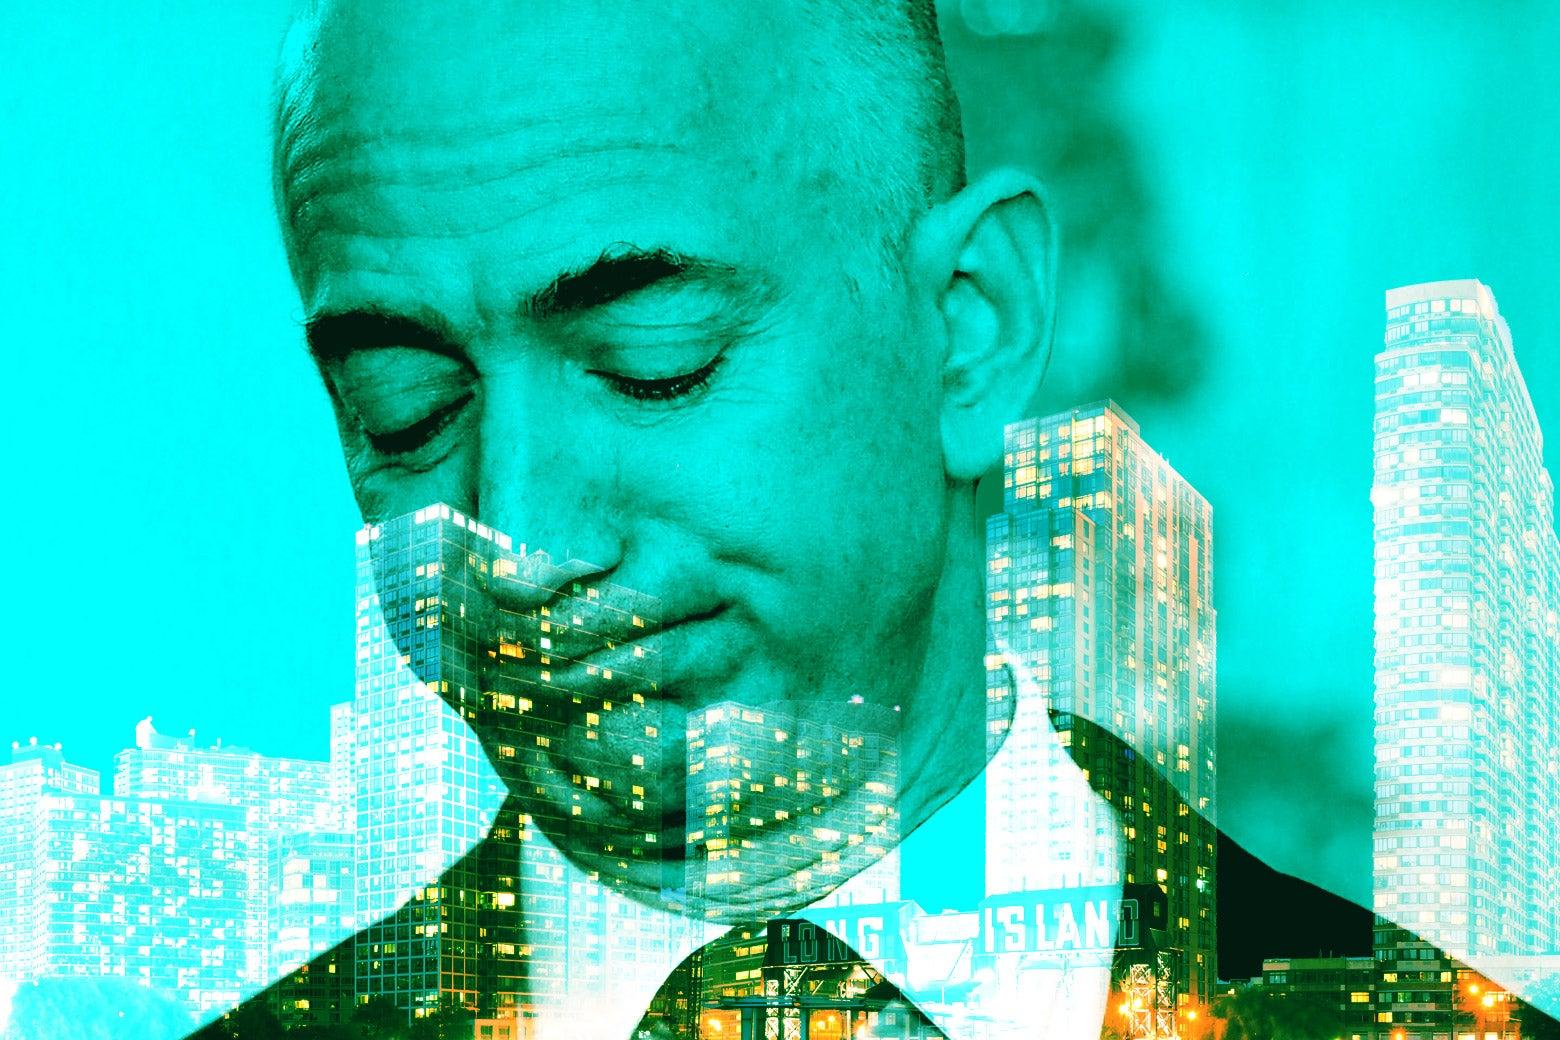 Jeff Bezos over the city skyline